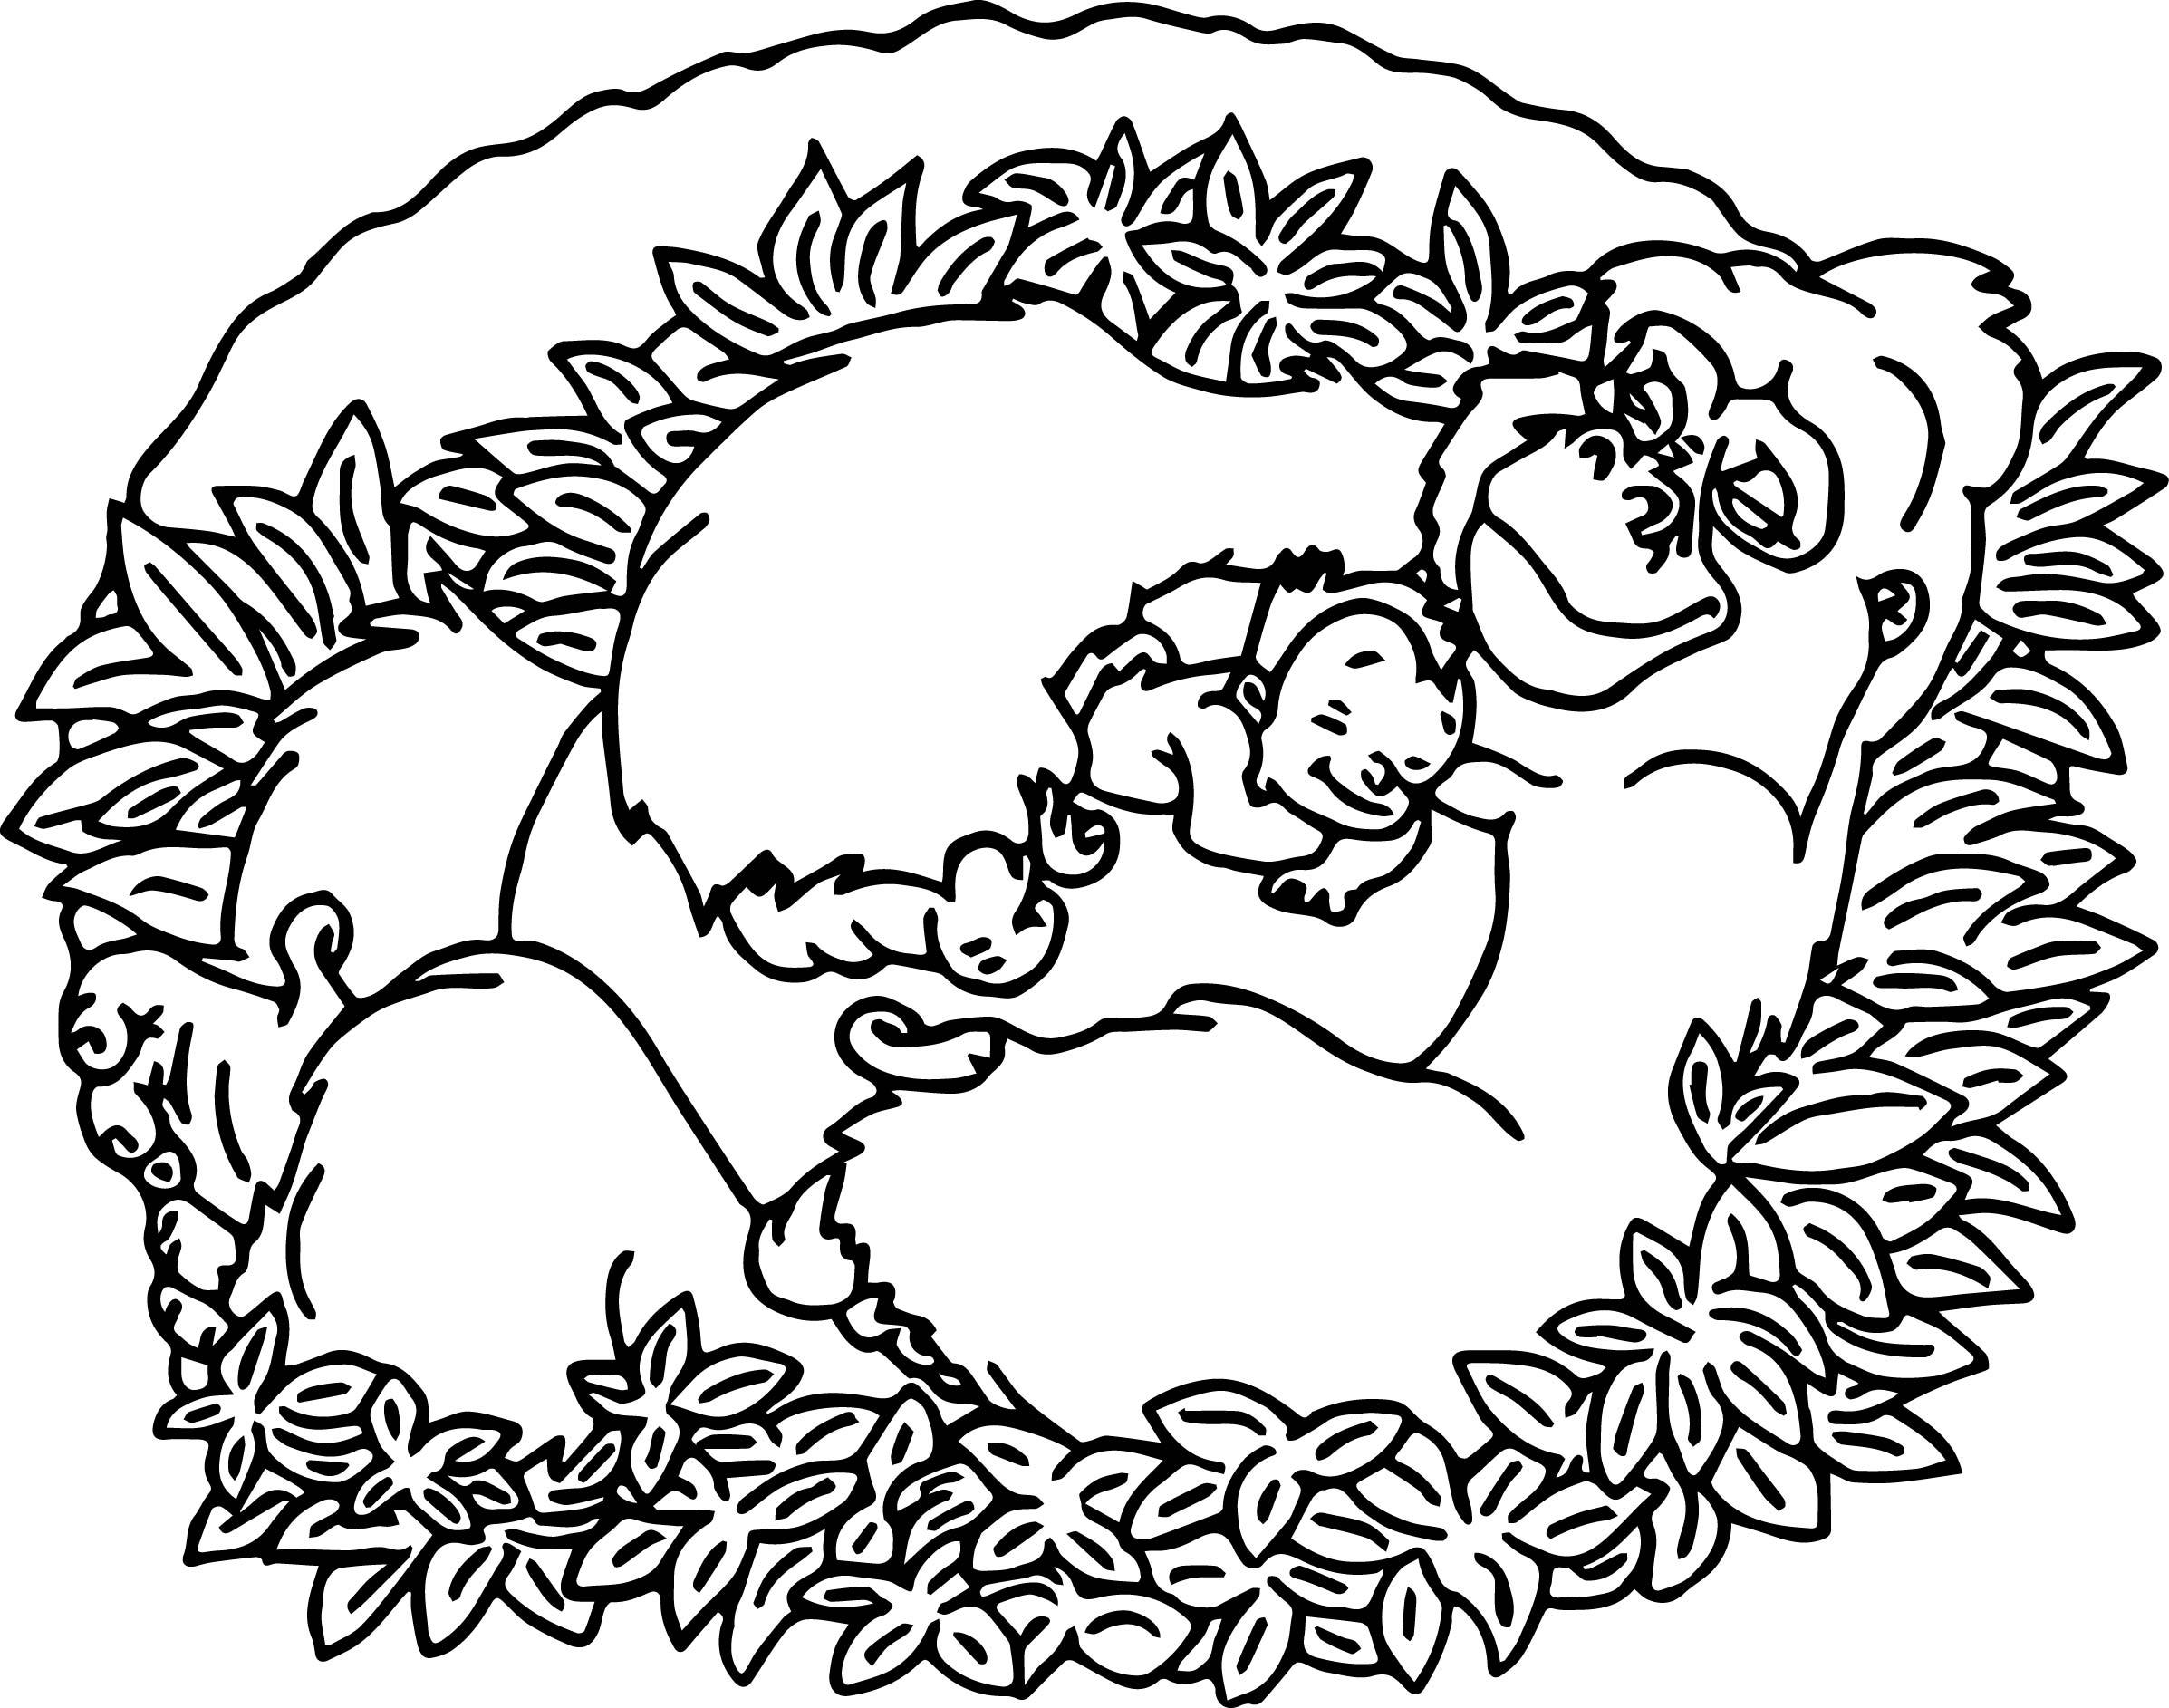 Disney Baby Tarzan Sleep Coloring Page